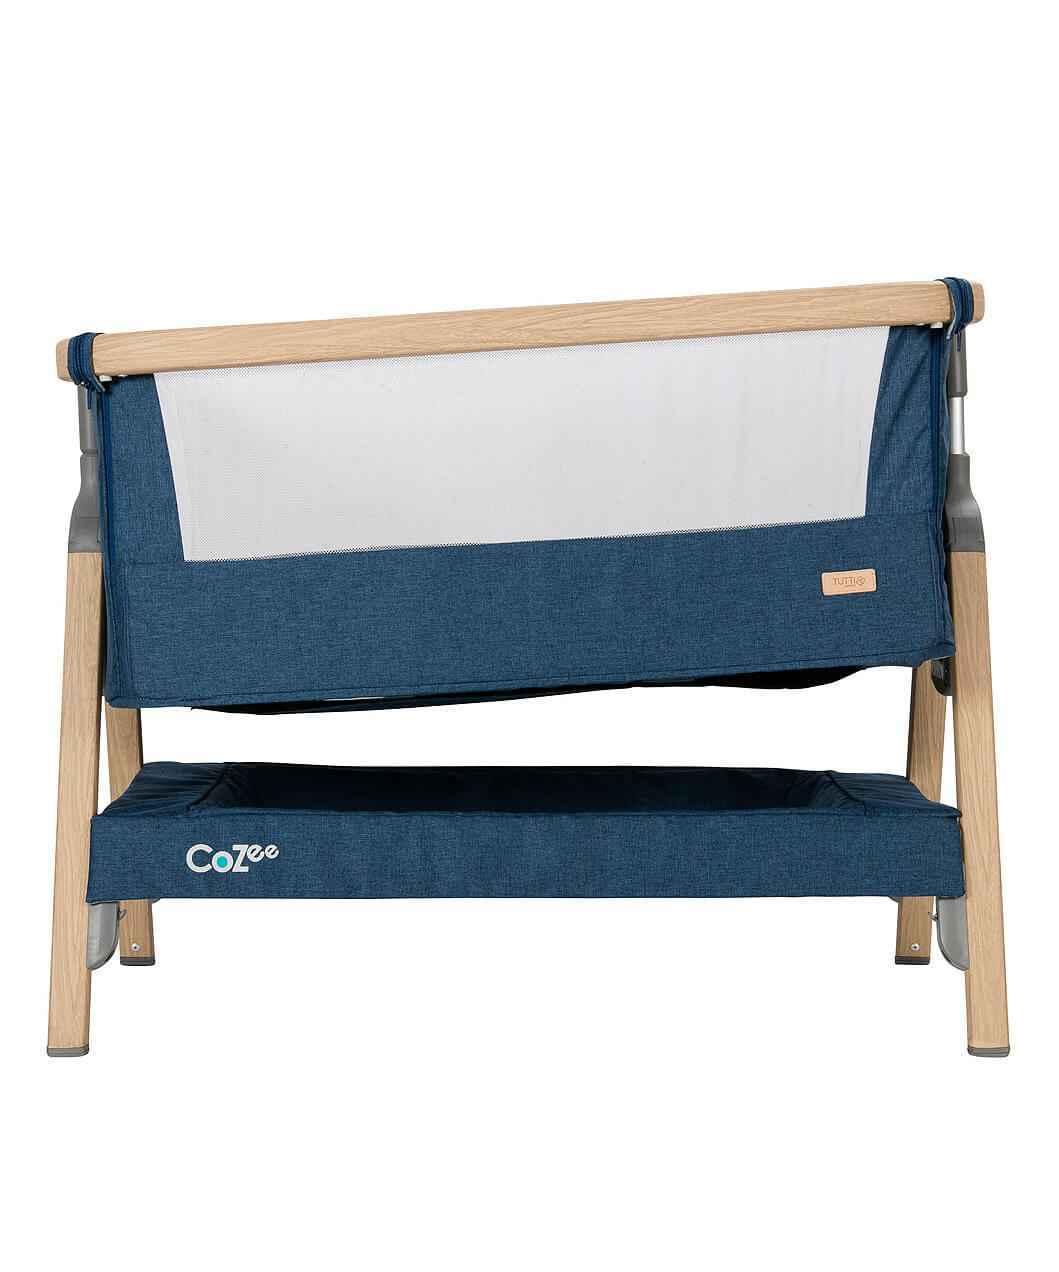 Tutti Bambini CoZee Bedside Crib - Oak & Blue - gigel - 4